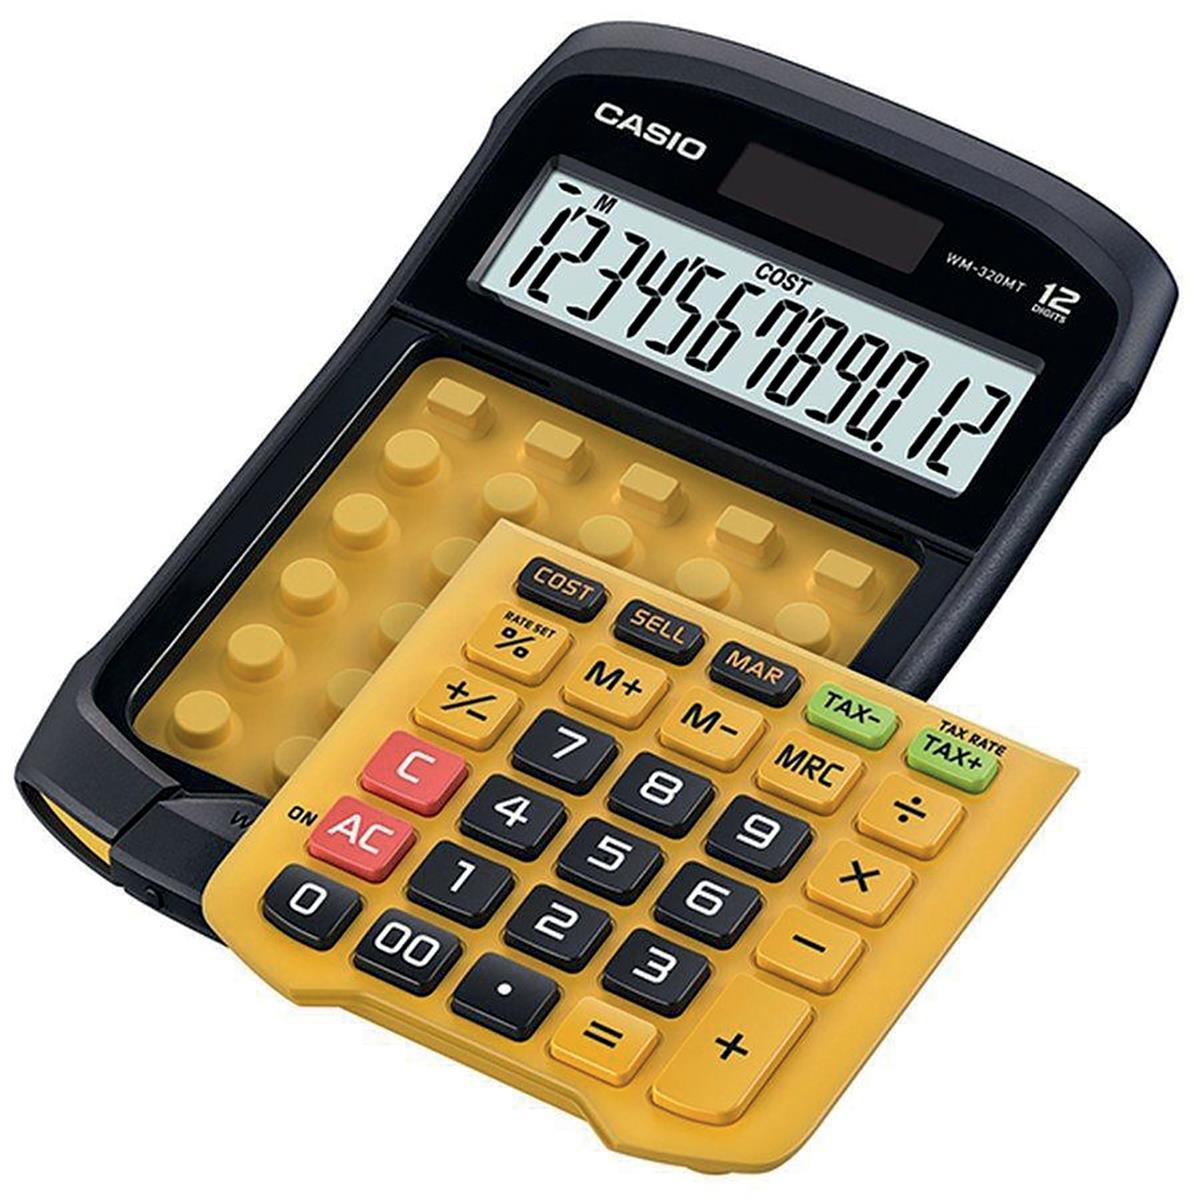 Casio Waterproof Calculator Battery/Solar-powered 12 Digit 3 Key Memory 109x169x33mm Ref WM-320MT